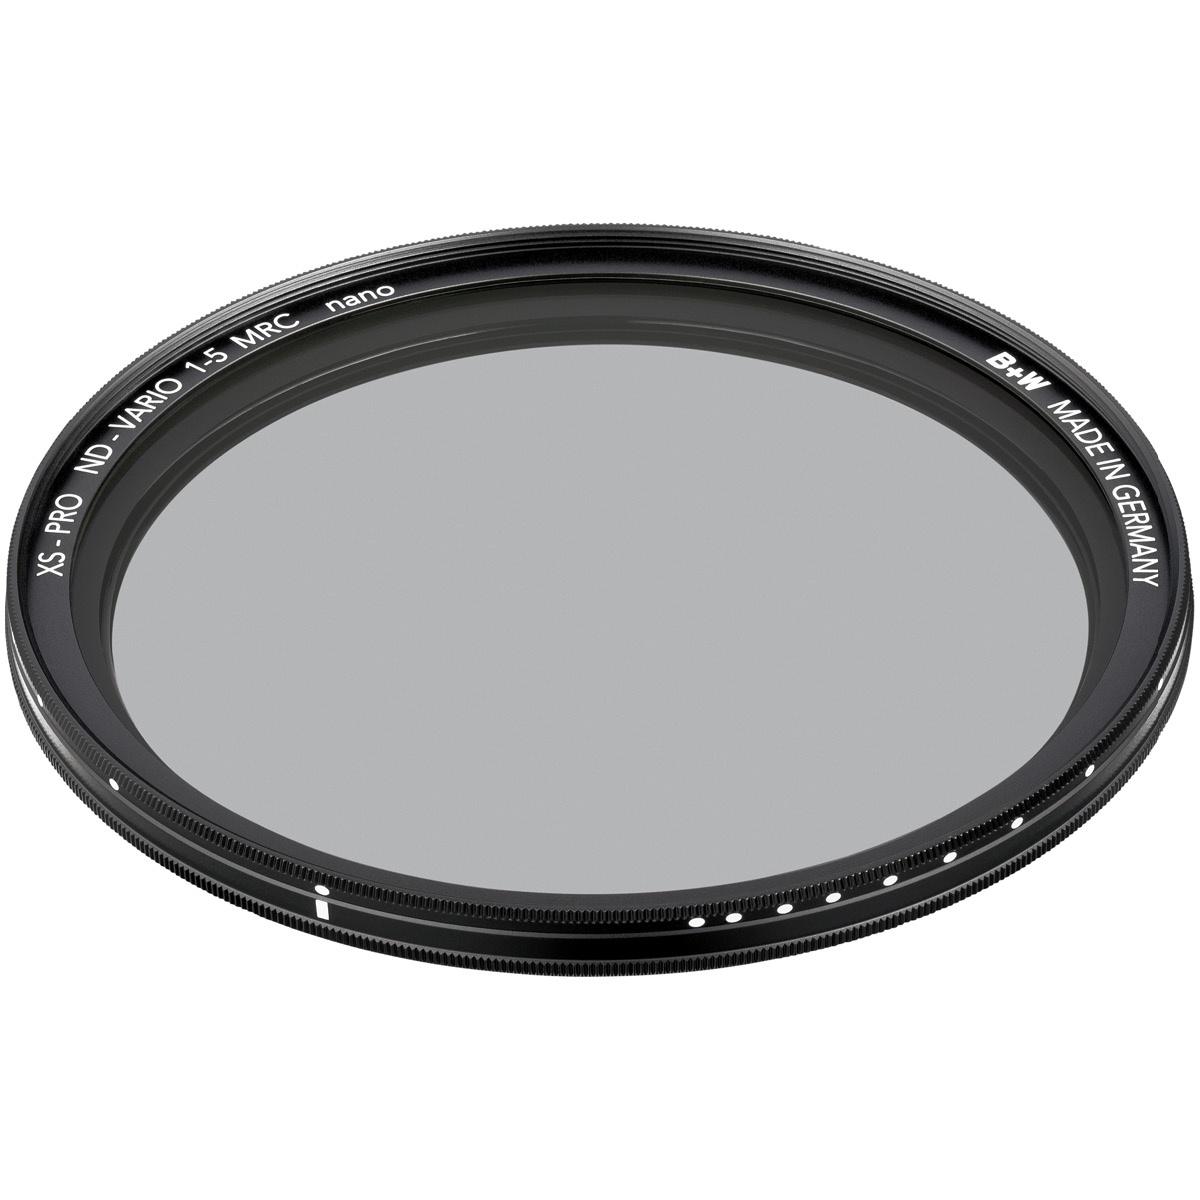 B+W Graufilter 72 mm XS-Pro Vario +1 - +5